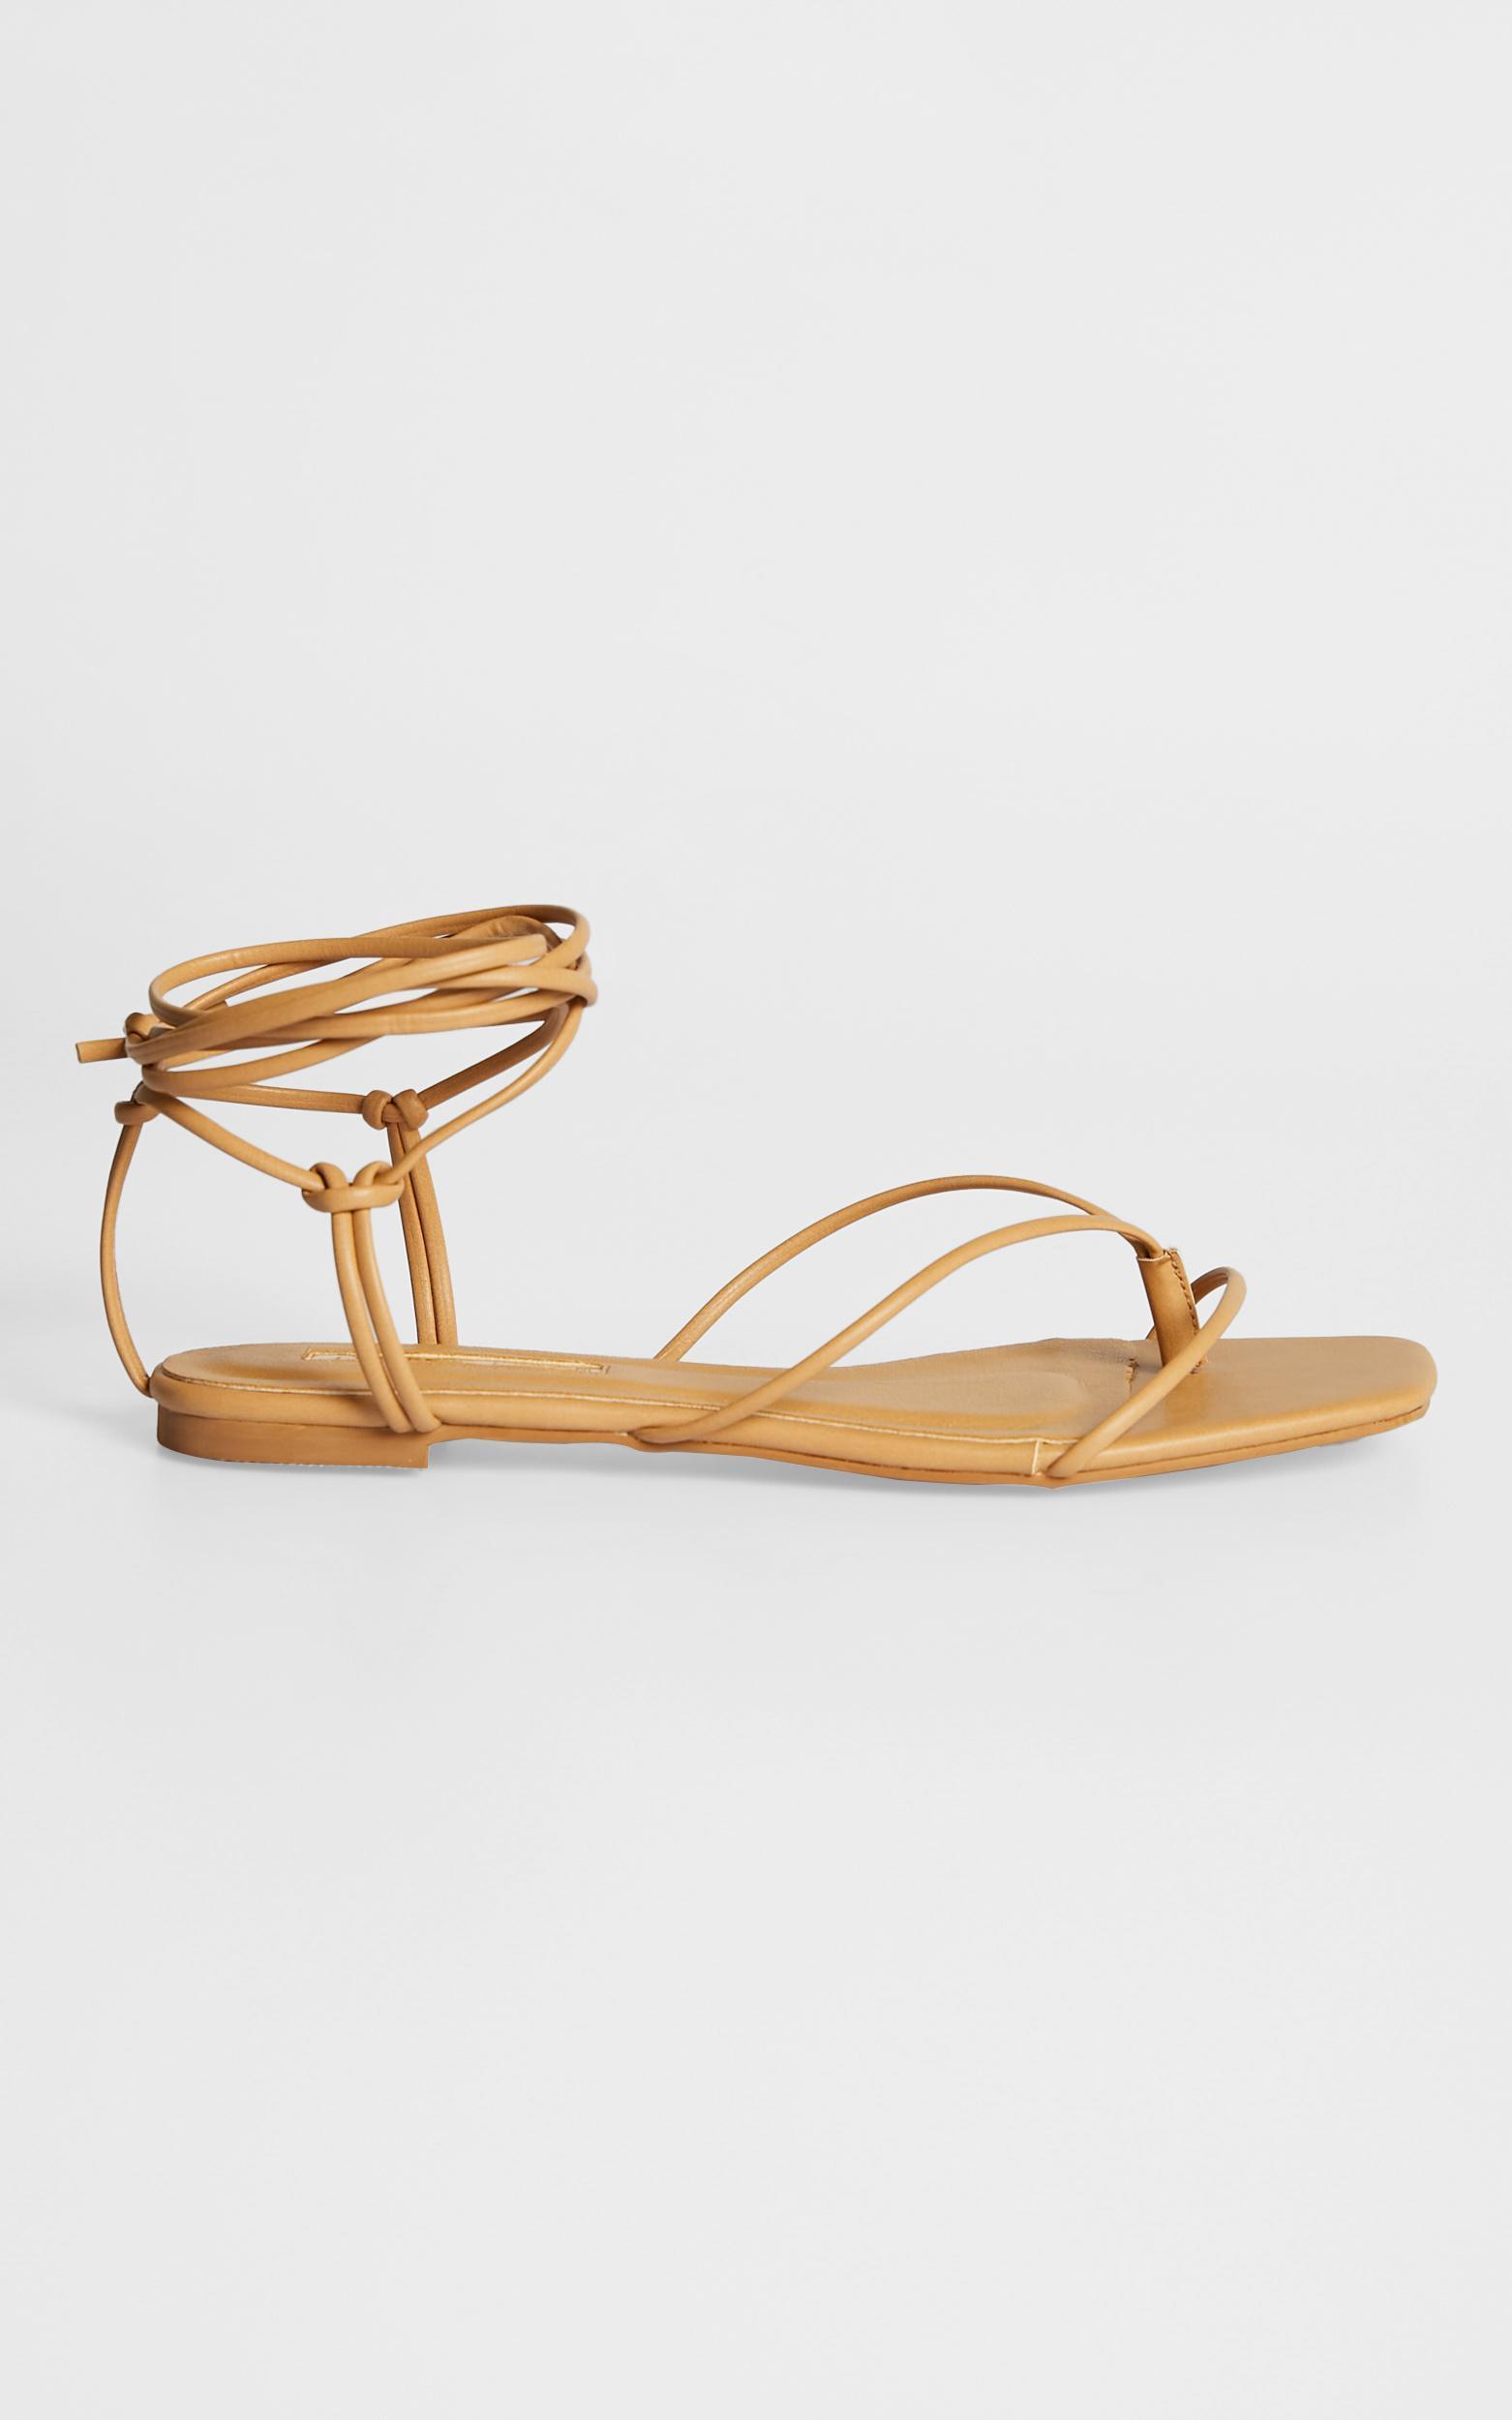 Billini - Amina Sandals in Desert - 5, Tan, hi-res image number null